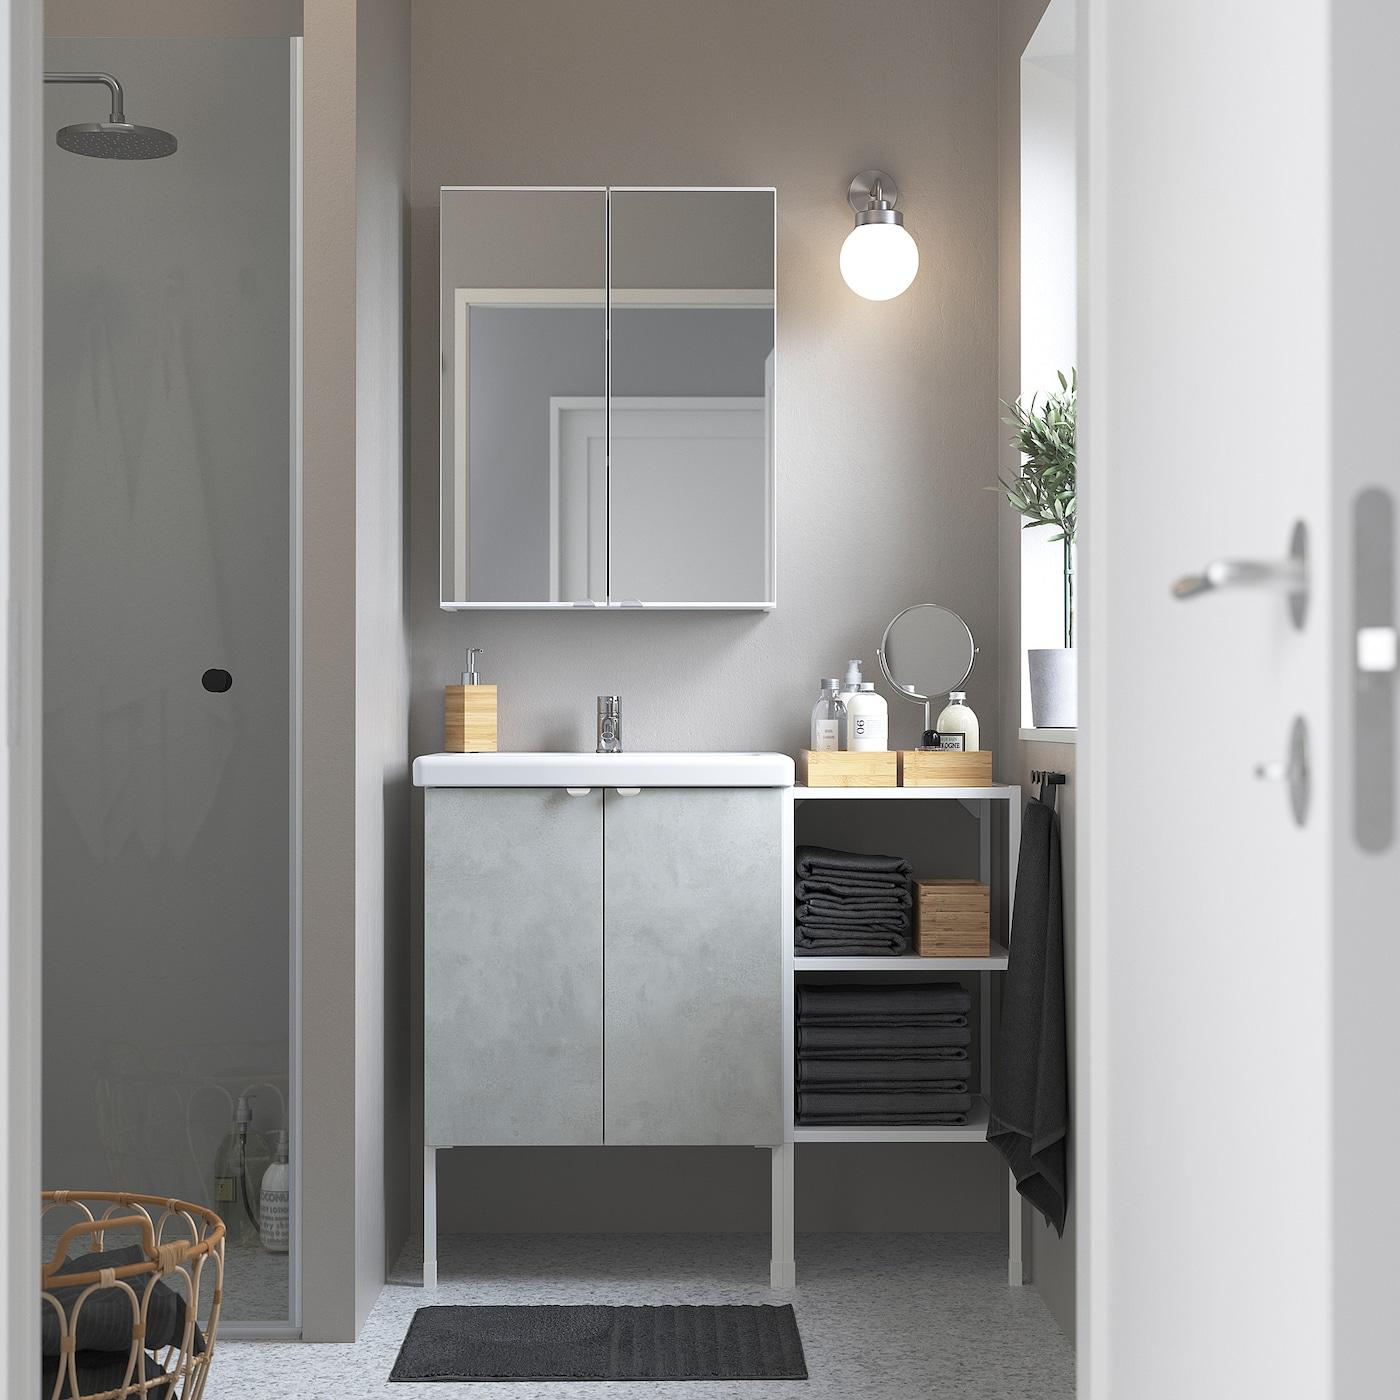 ENHET / TVÄLLEN Badkamermeubels, 14-delig, betonpatroon/wit PILKÅN kraan, 102x43x87 cm